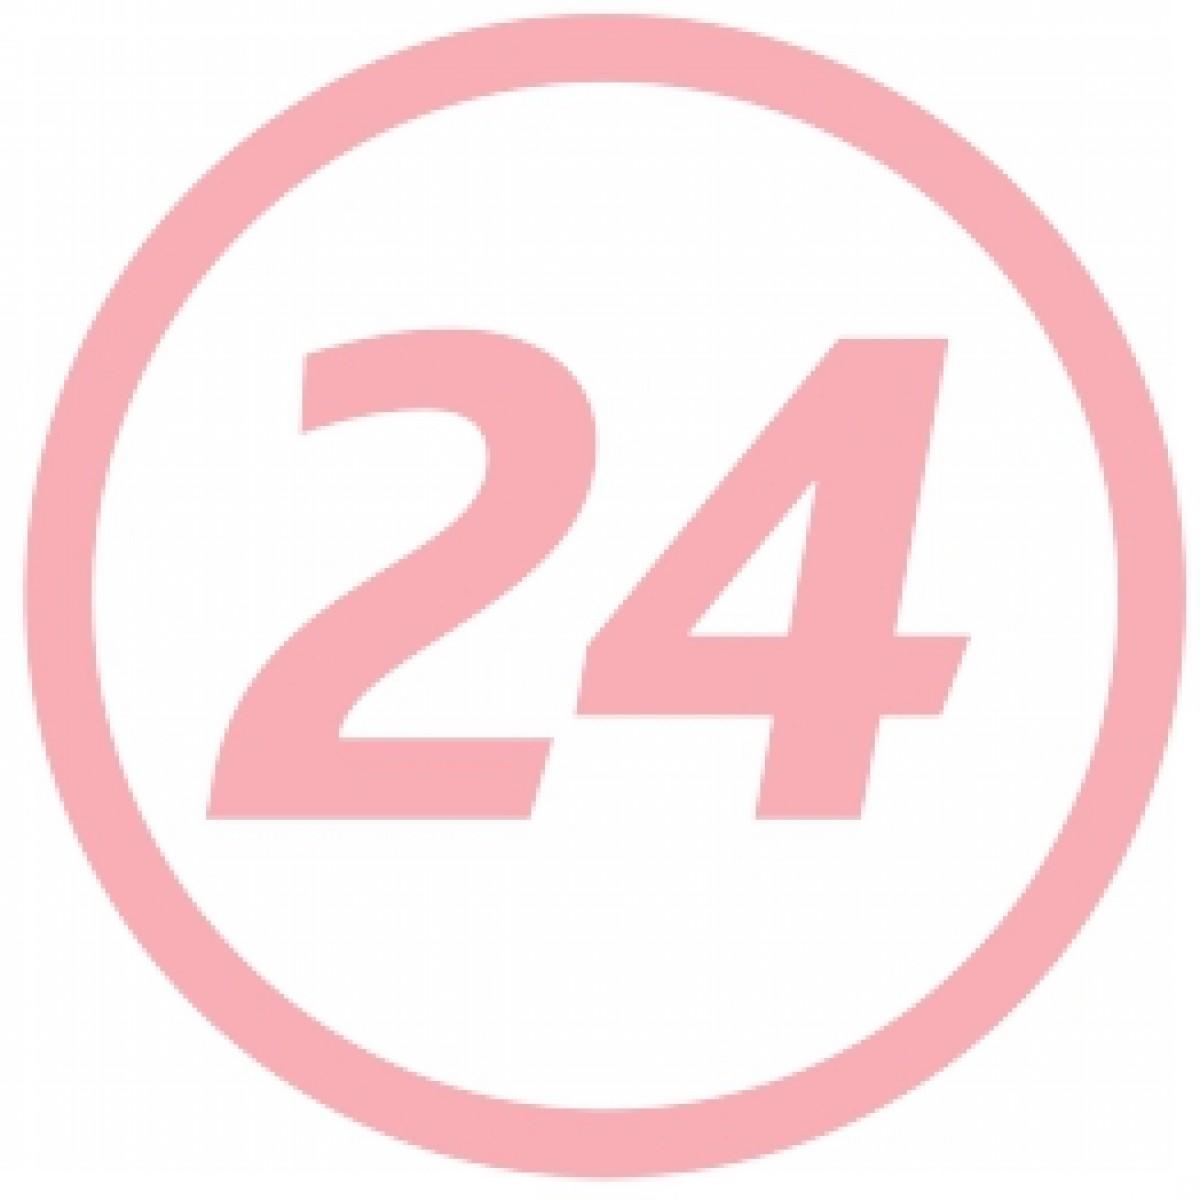 HARTMANN Peha-Taft Manusi Chirurgicale Pudrate Marimea 7.5, Manusi Chirurgicale, 1buc